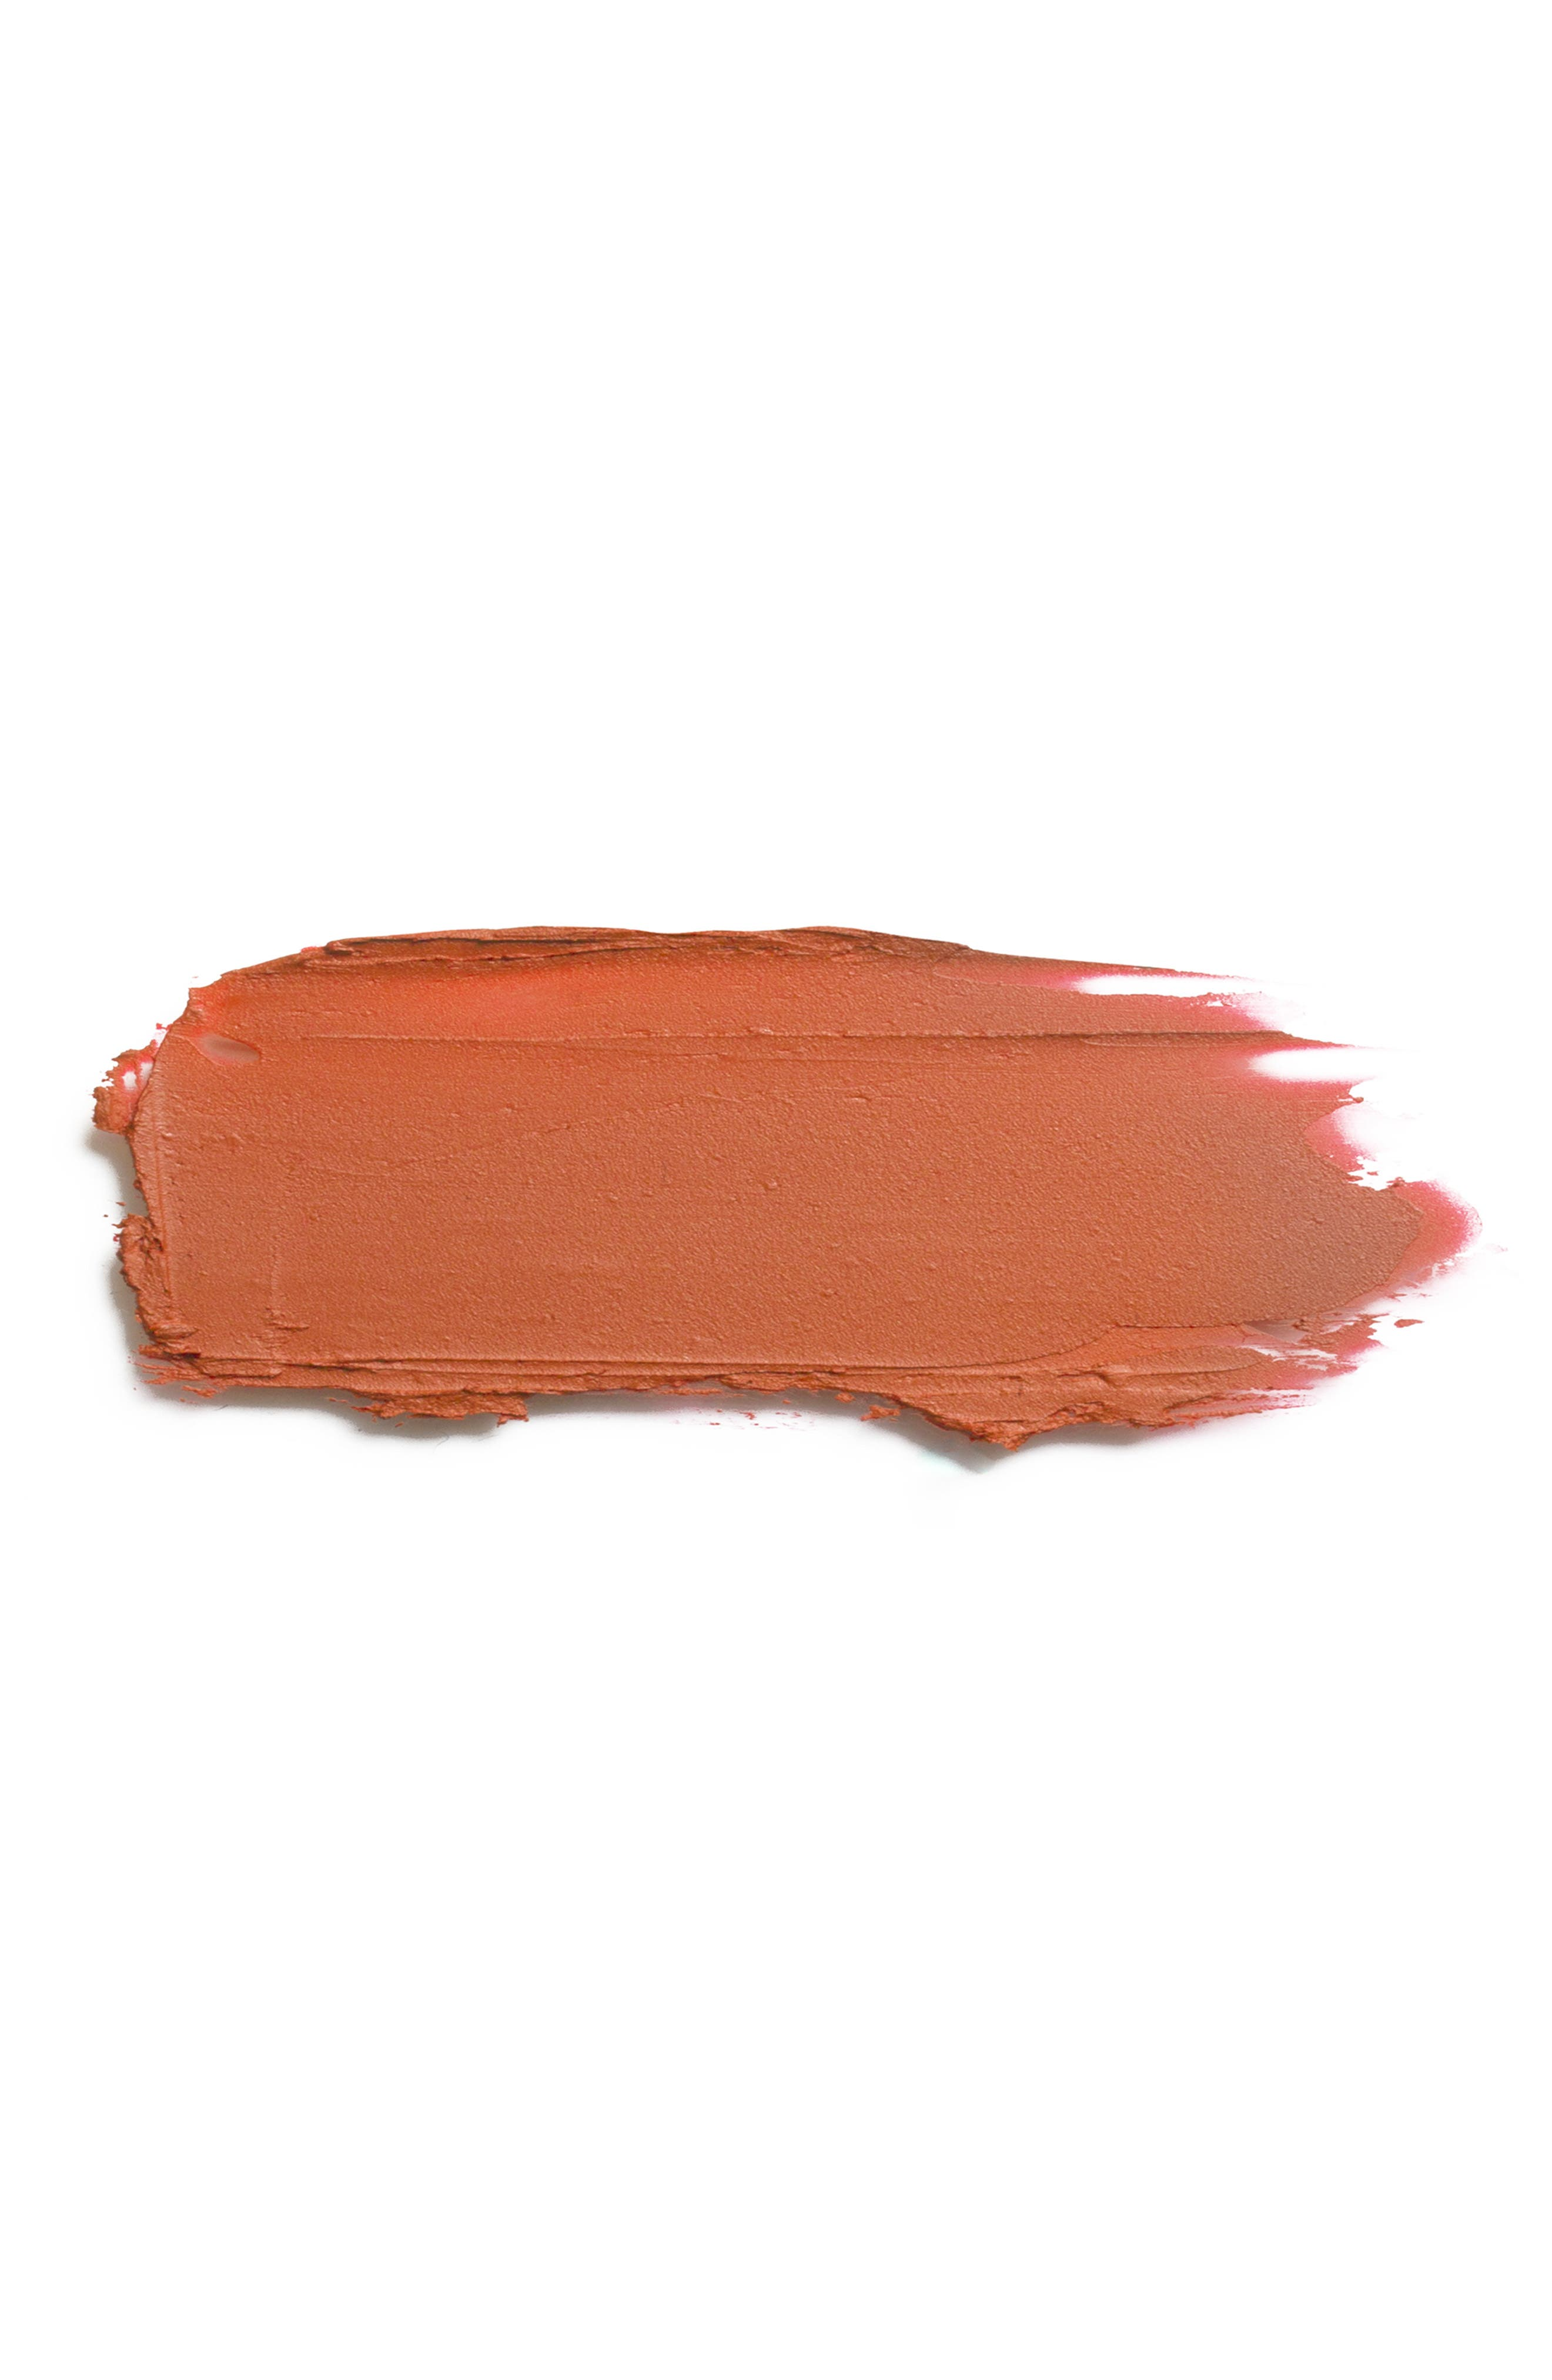 SISLEY PARIS,                             Le Phyto-Rouge Lipstick,                             Alternate thumbnail 3, color,                             12 - BEIGE BALI